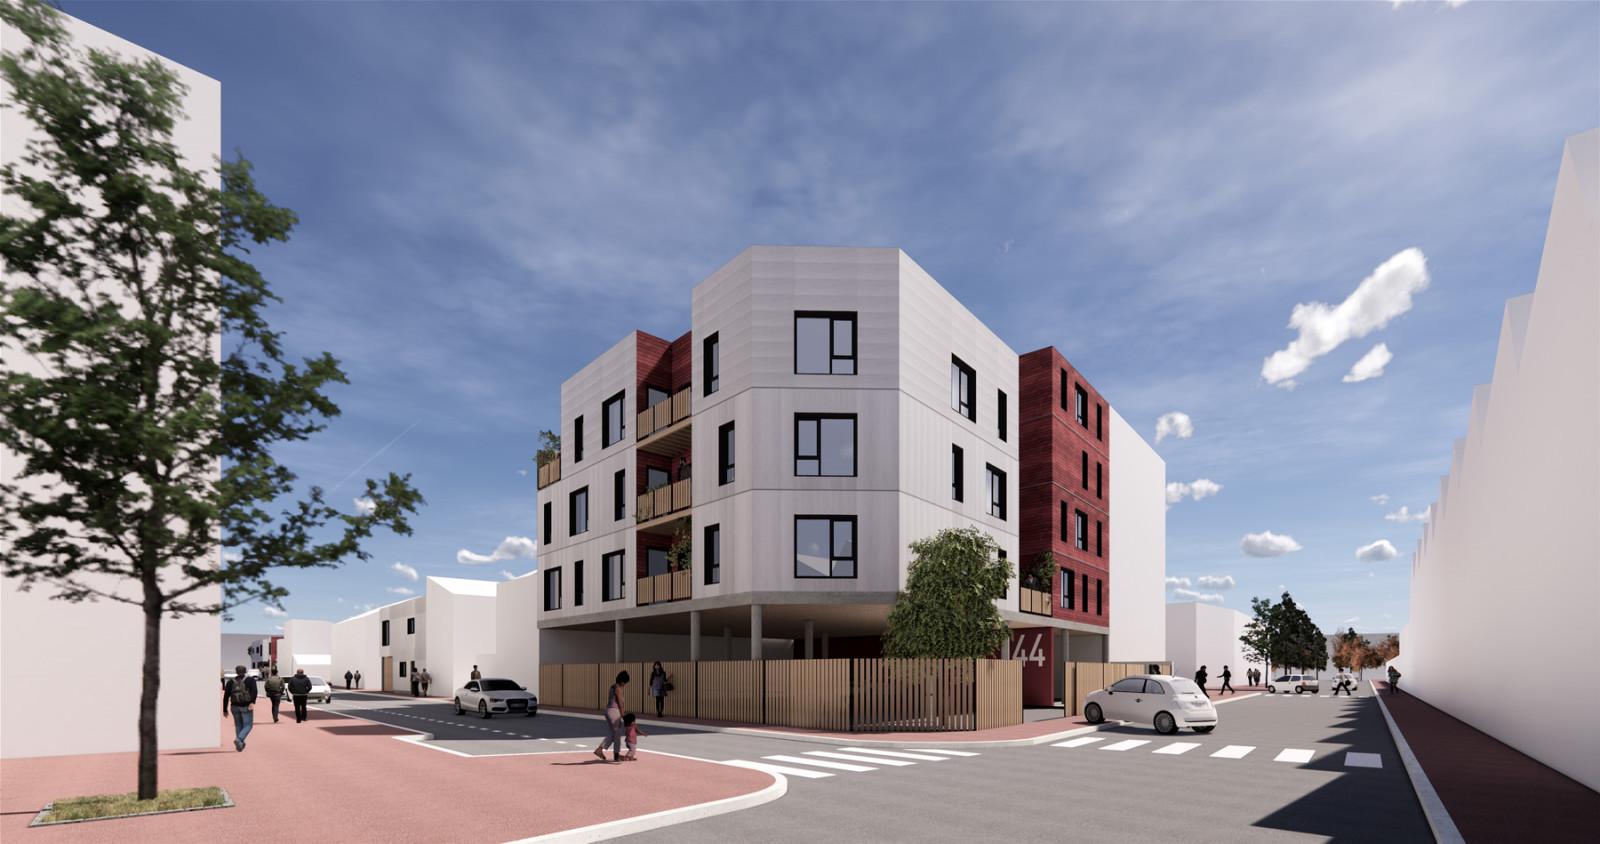 graam-la-traversee-01-logements-gennevilliers-exterieur-rue-collectif